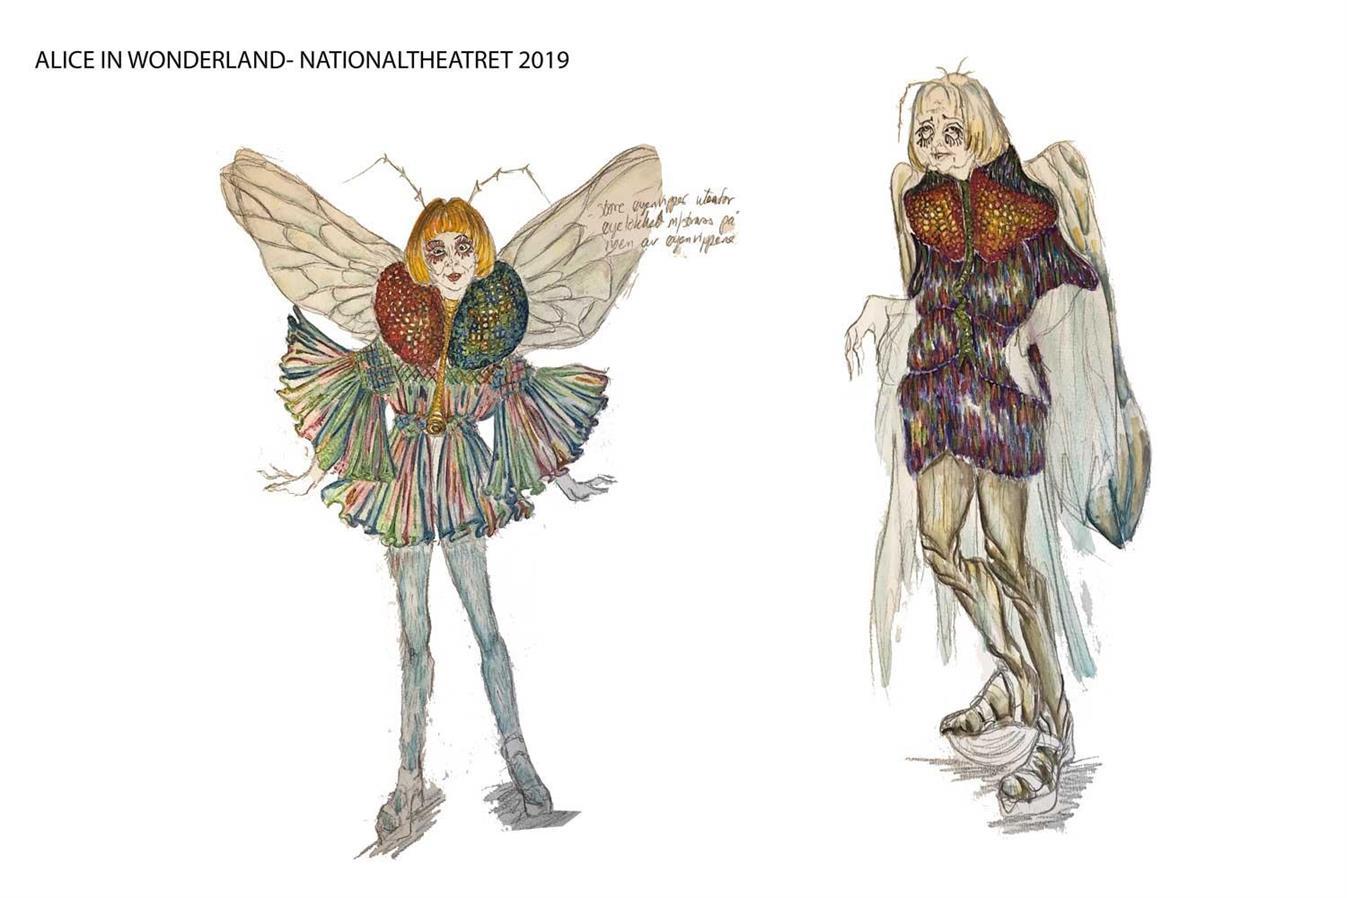 Alice in wonderland - Nationaltheatret- Director: Mads Bones - 2019 - Costume Design: Christina Lovery